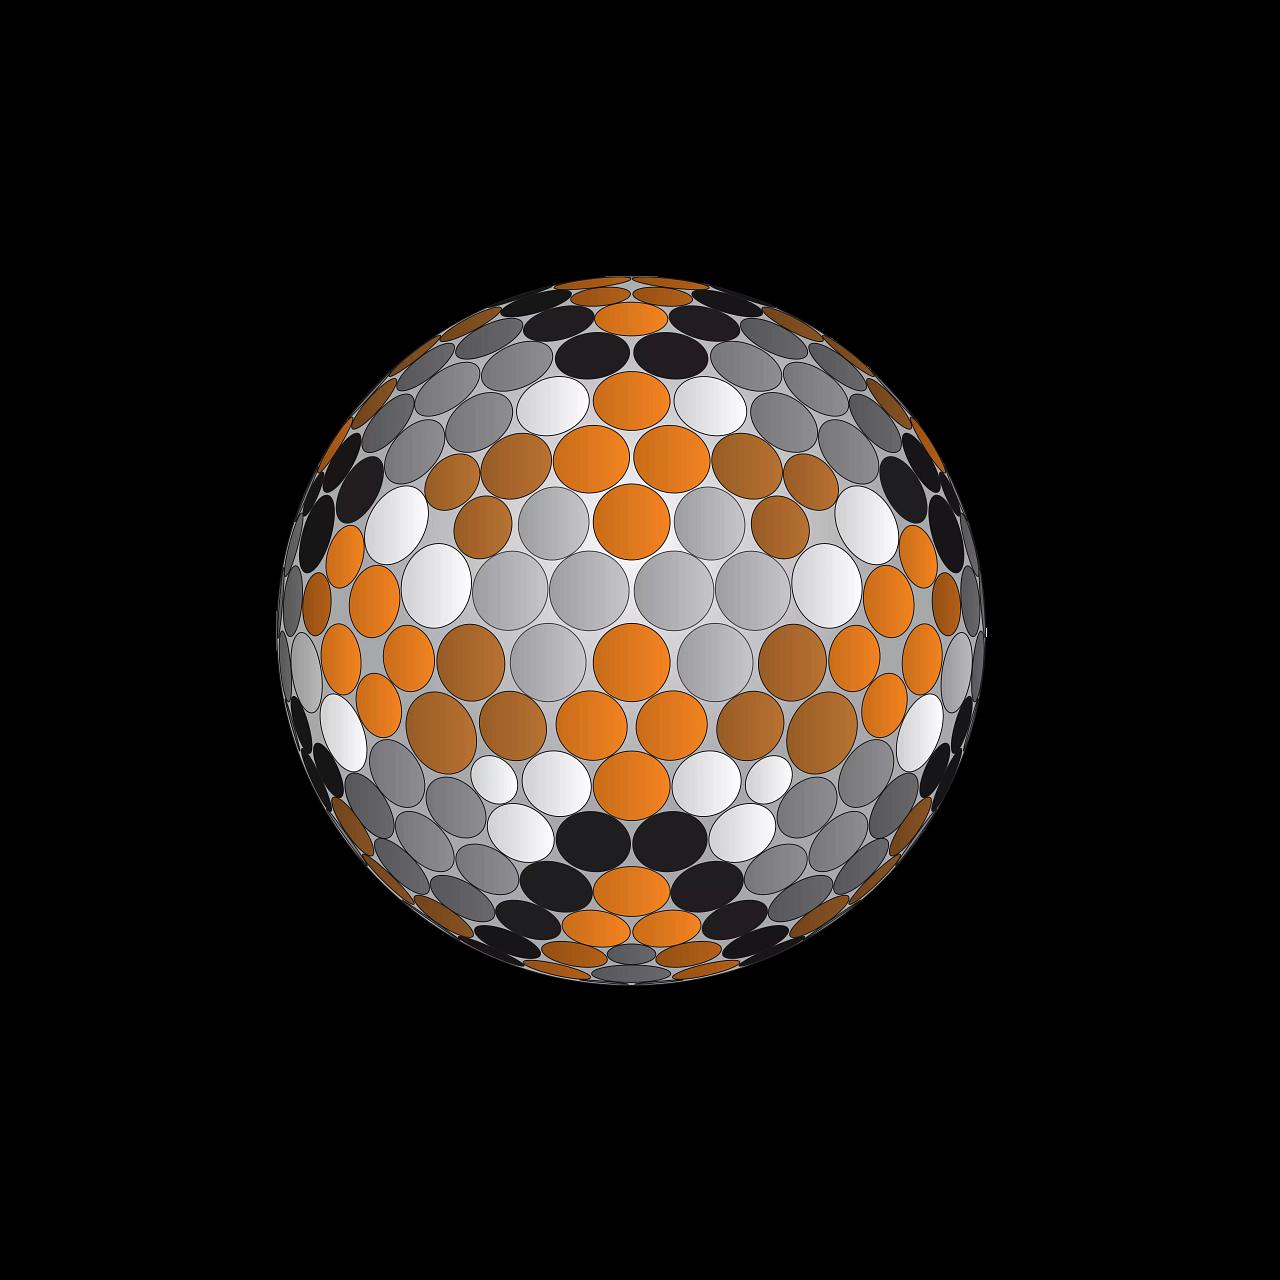 Titleist Pro V1 Dozen Golf Balls 2021 - Dimple Pattern